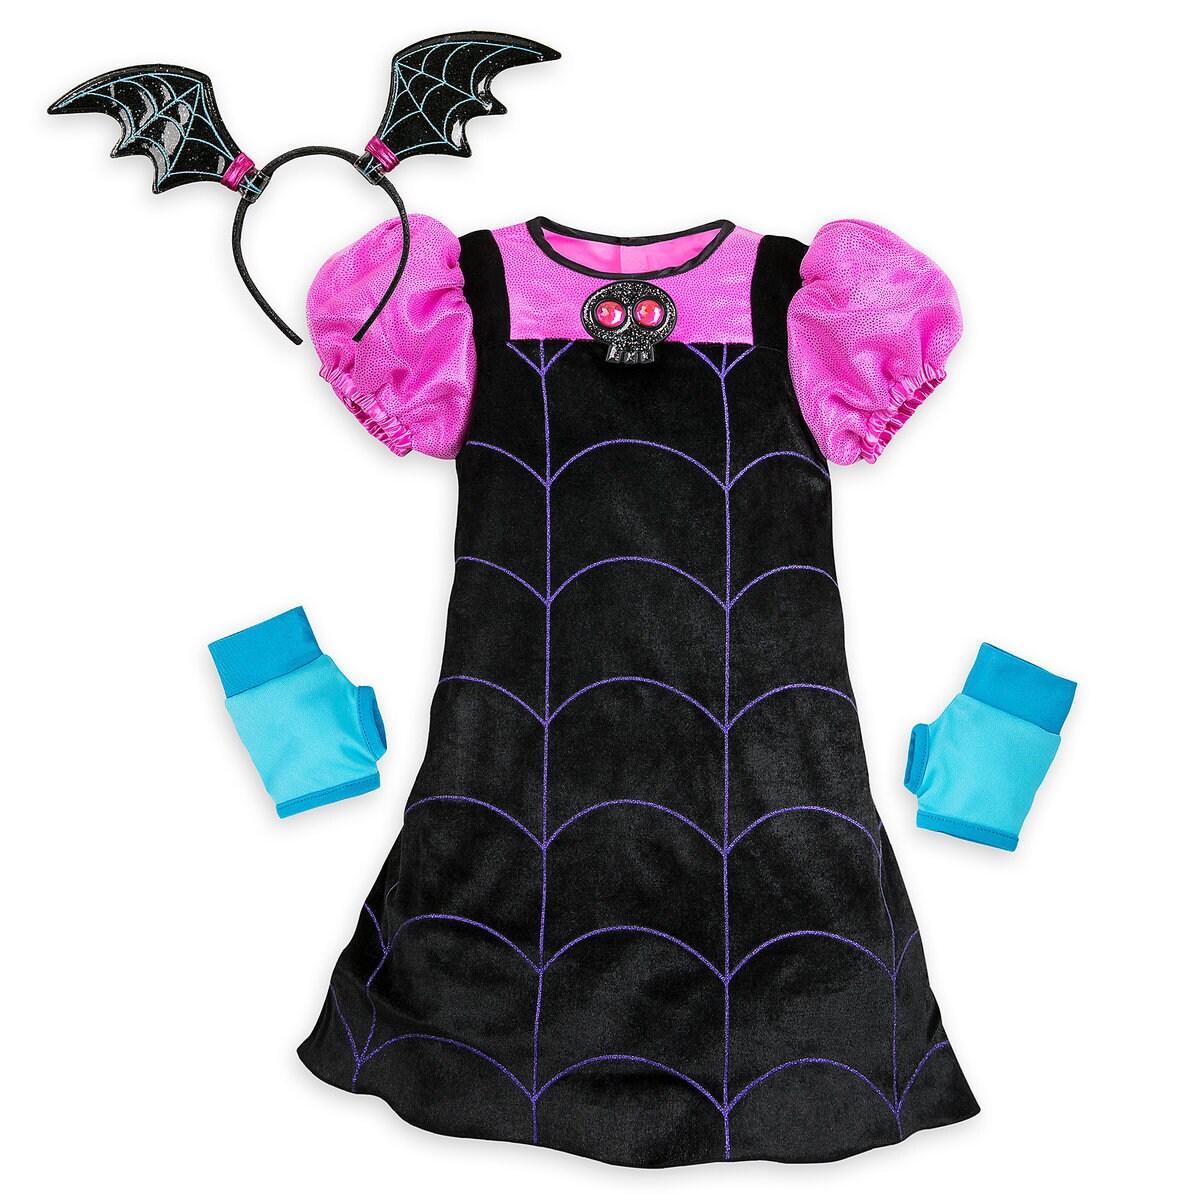 e9db455fd200 Product Image of Vampirina Costume for Girls   1